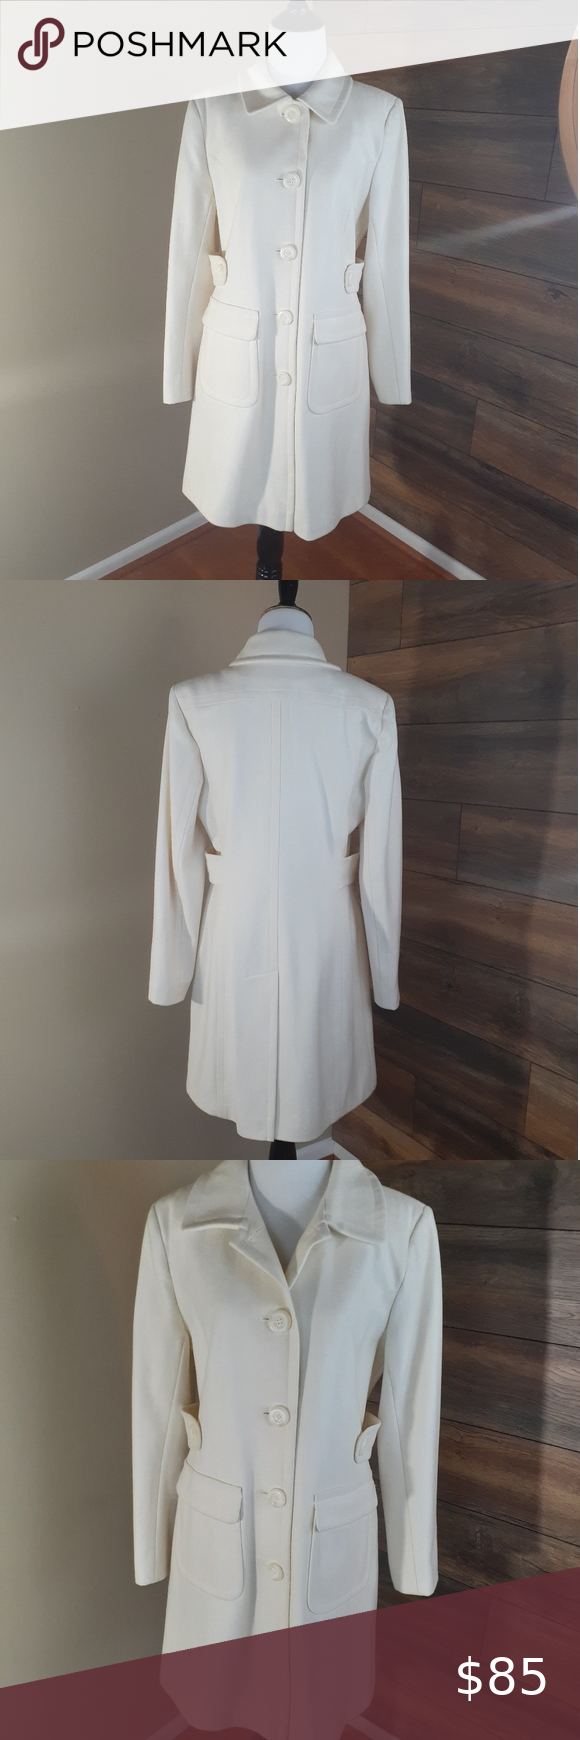 White Winter Dress Coat White Dress Winter Winter Coat Dress Winter Dresses [ 1740 x 580 Pixel ]